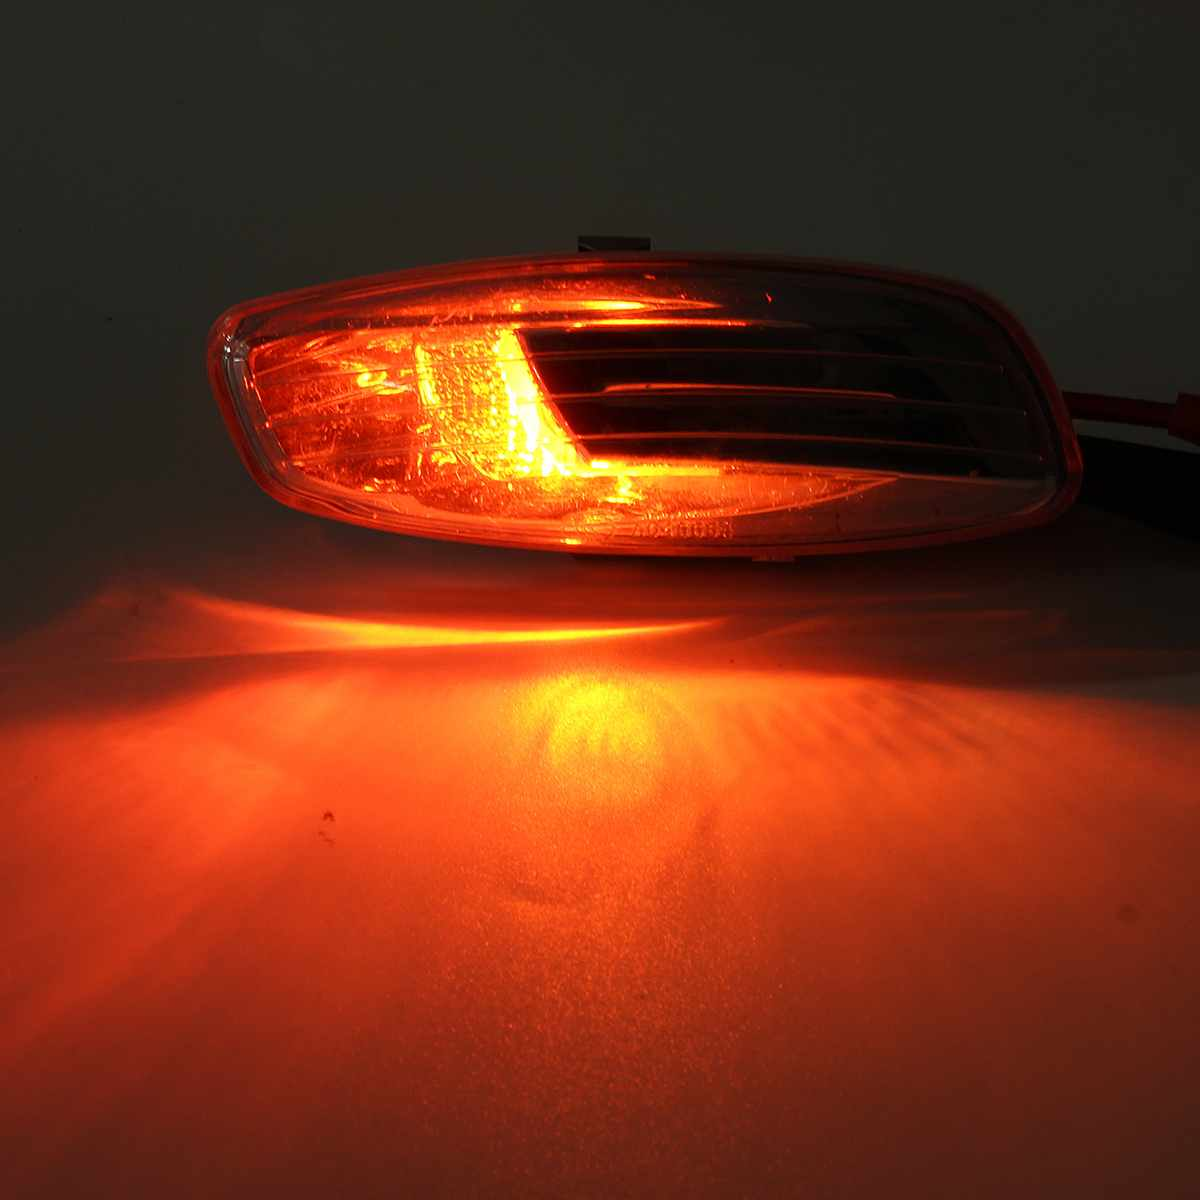 2x citroen DS3 4-LED side repeater indicateur turn signal lumière lampe ampoules